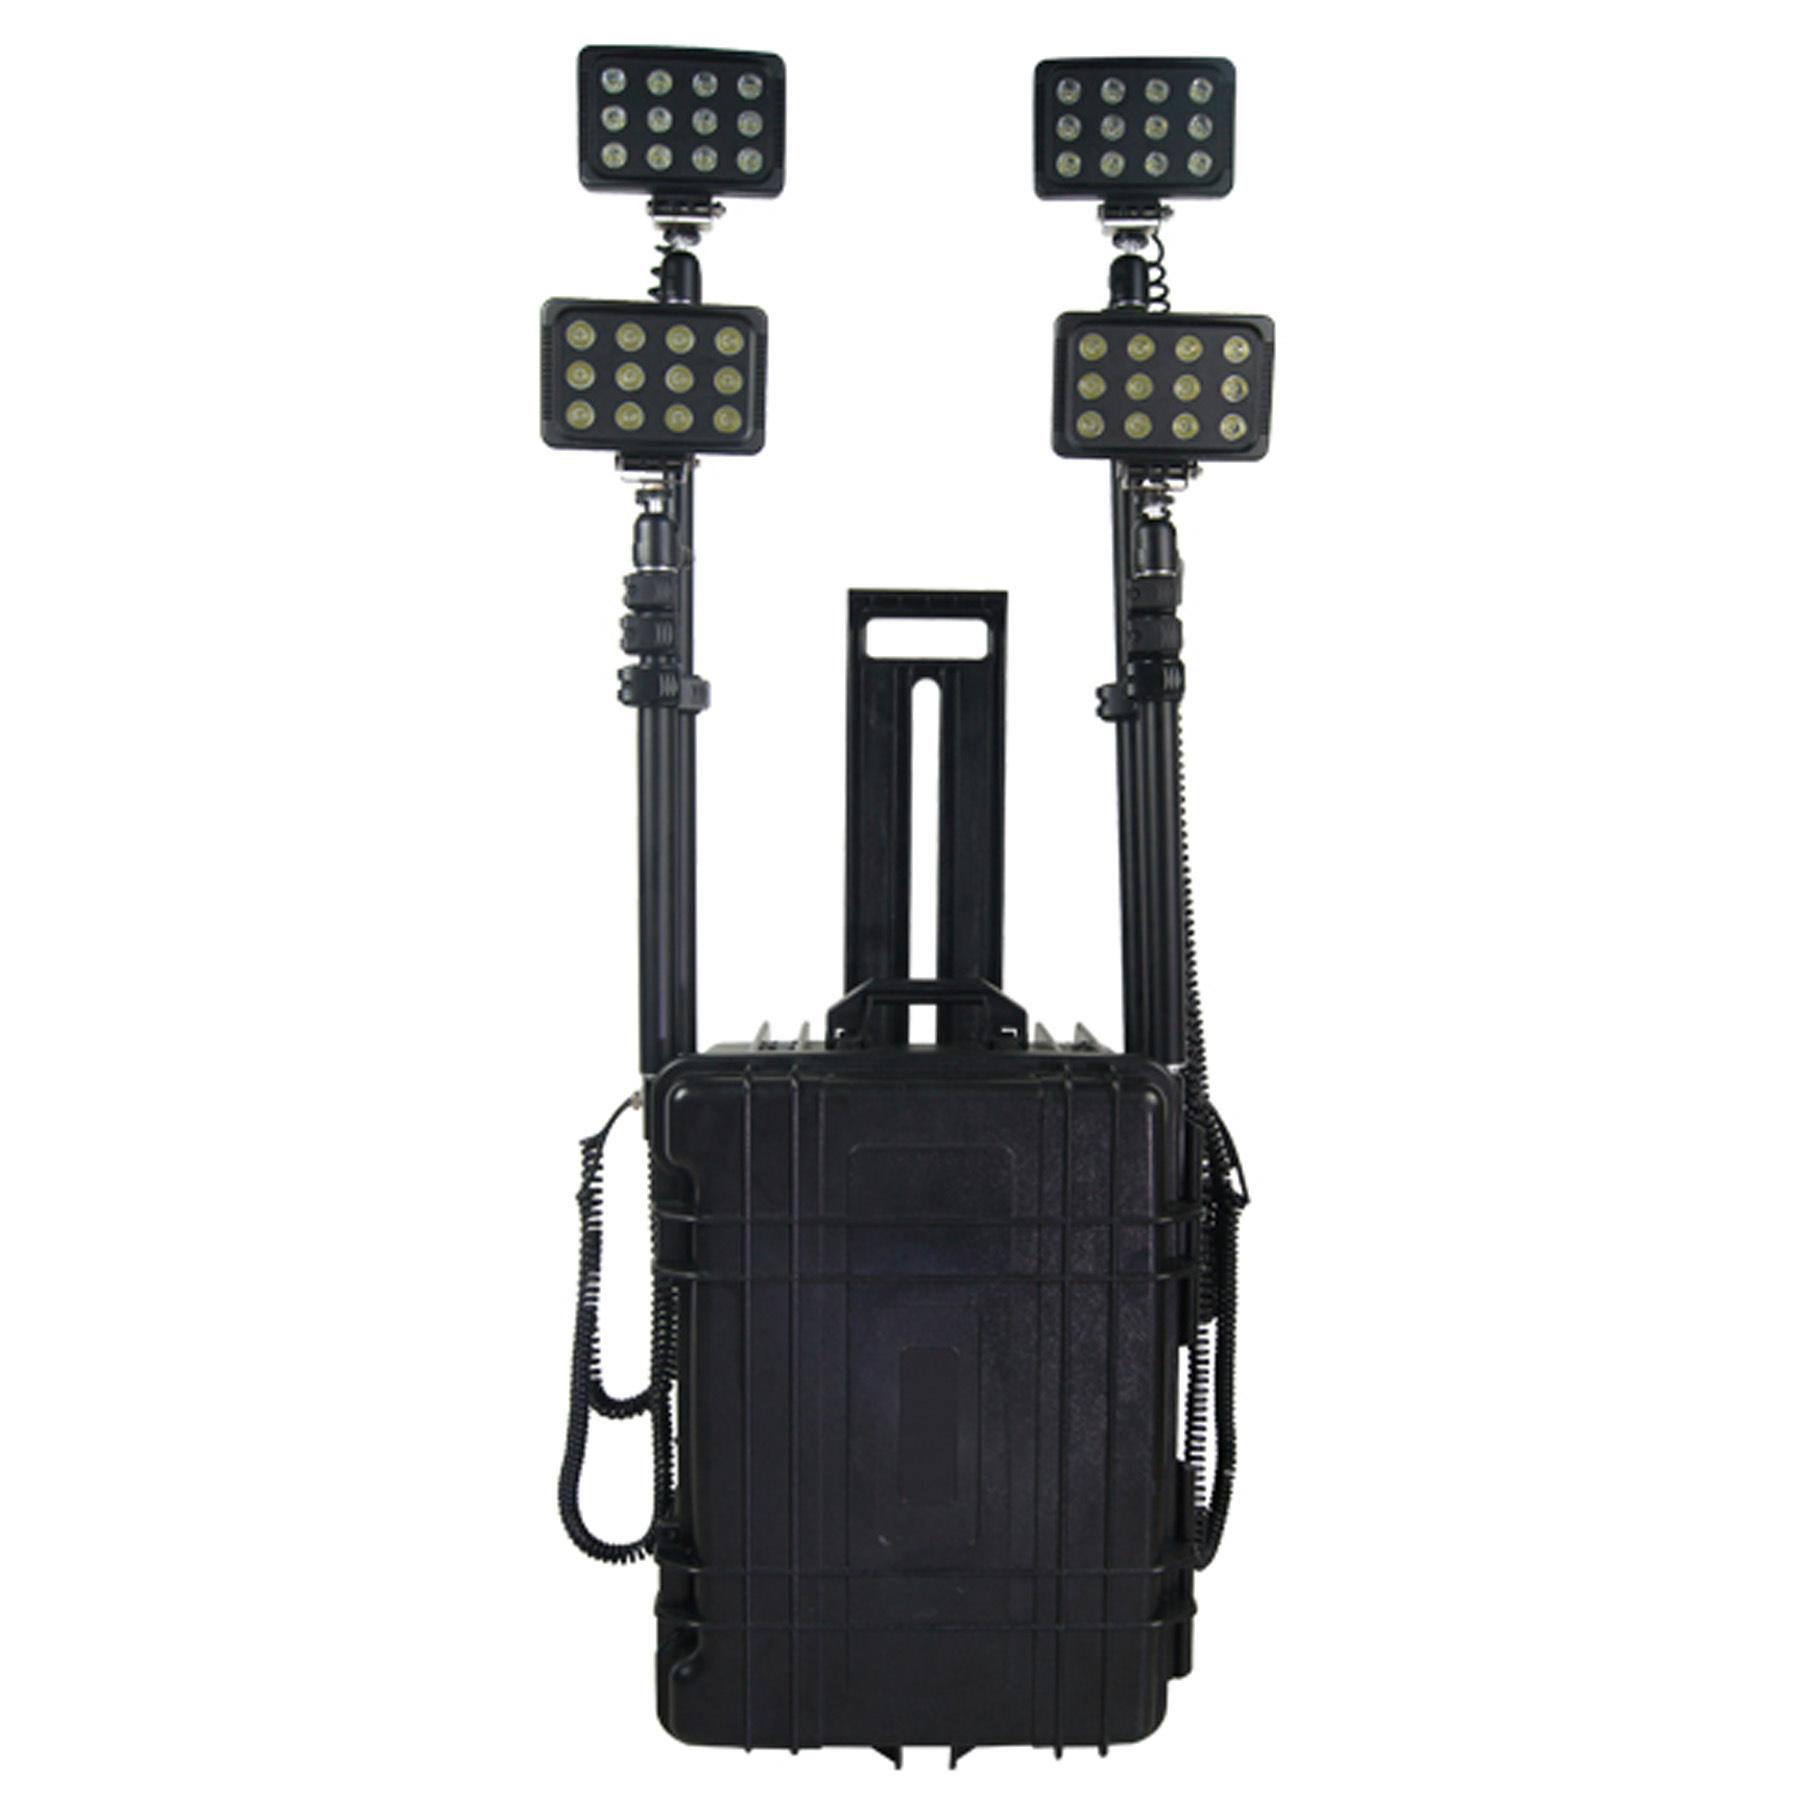 Just Plug Lighting System Woodland Scenics